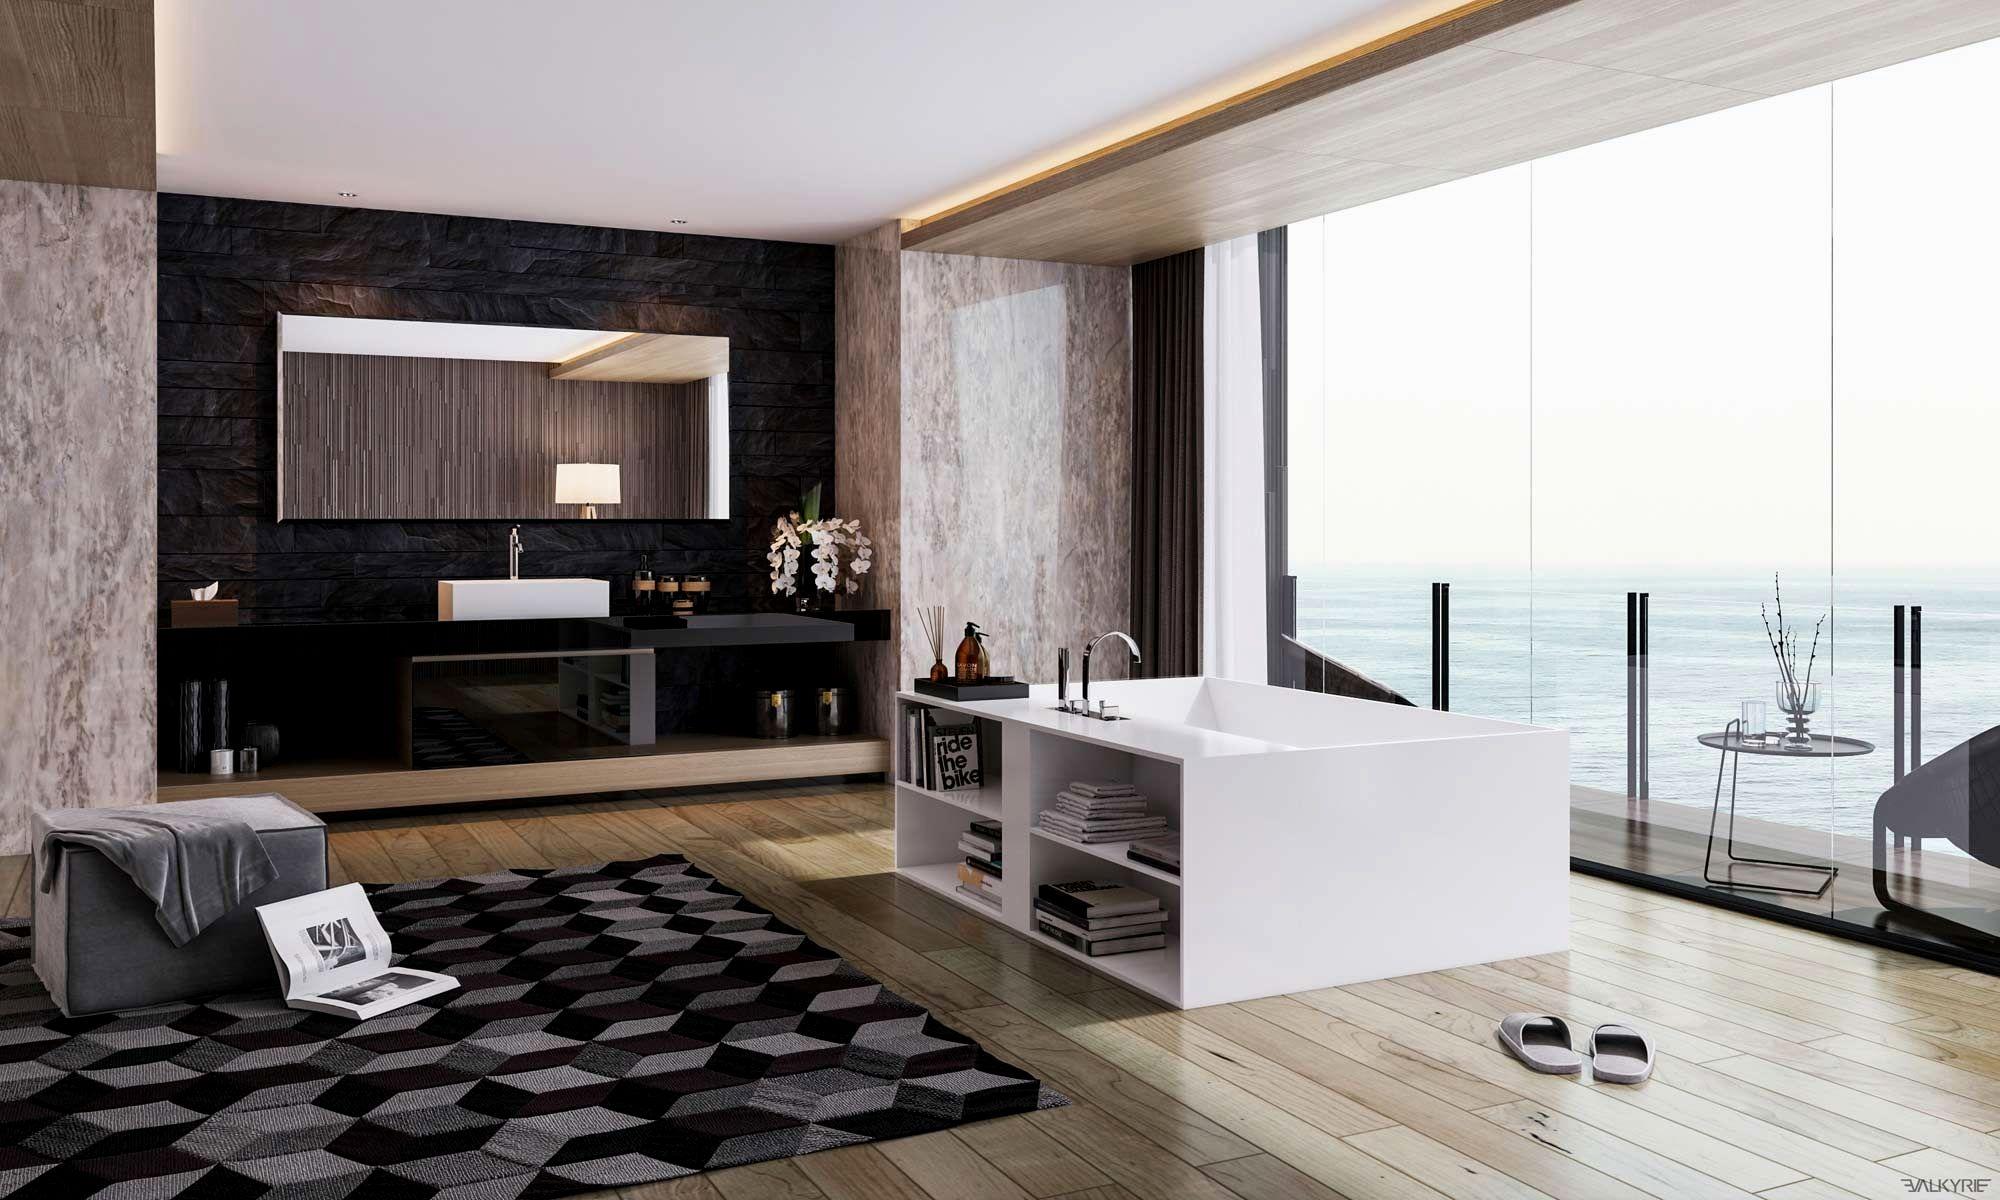 amazing white tile bathroom floor inspiration-Excellent White Tile Bathroom Floor Pattern